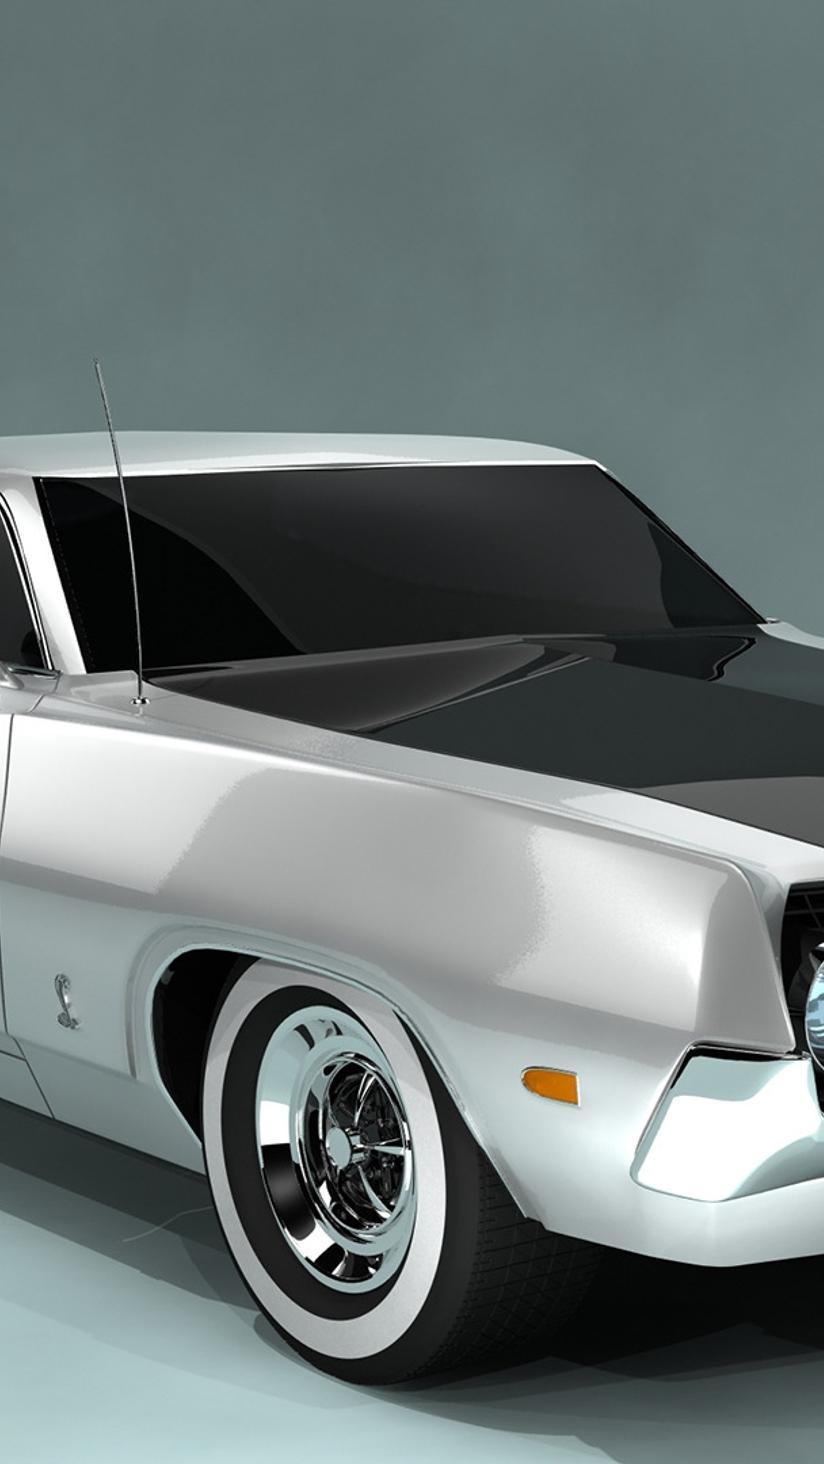 White And Black Ford Torino Cobra Wallpaper Download 824x1464